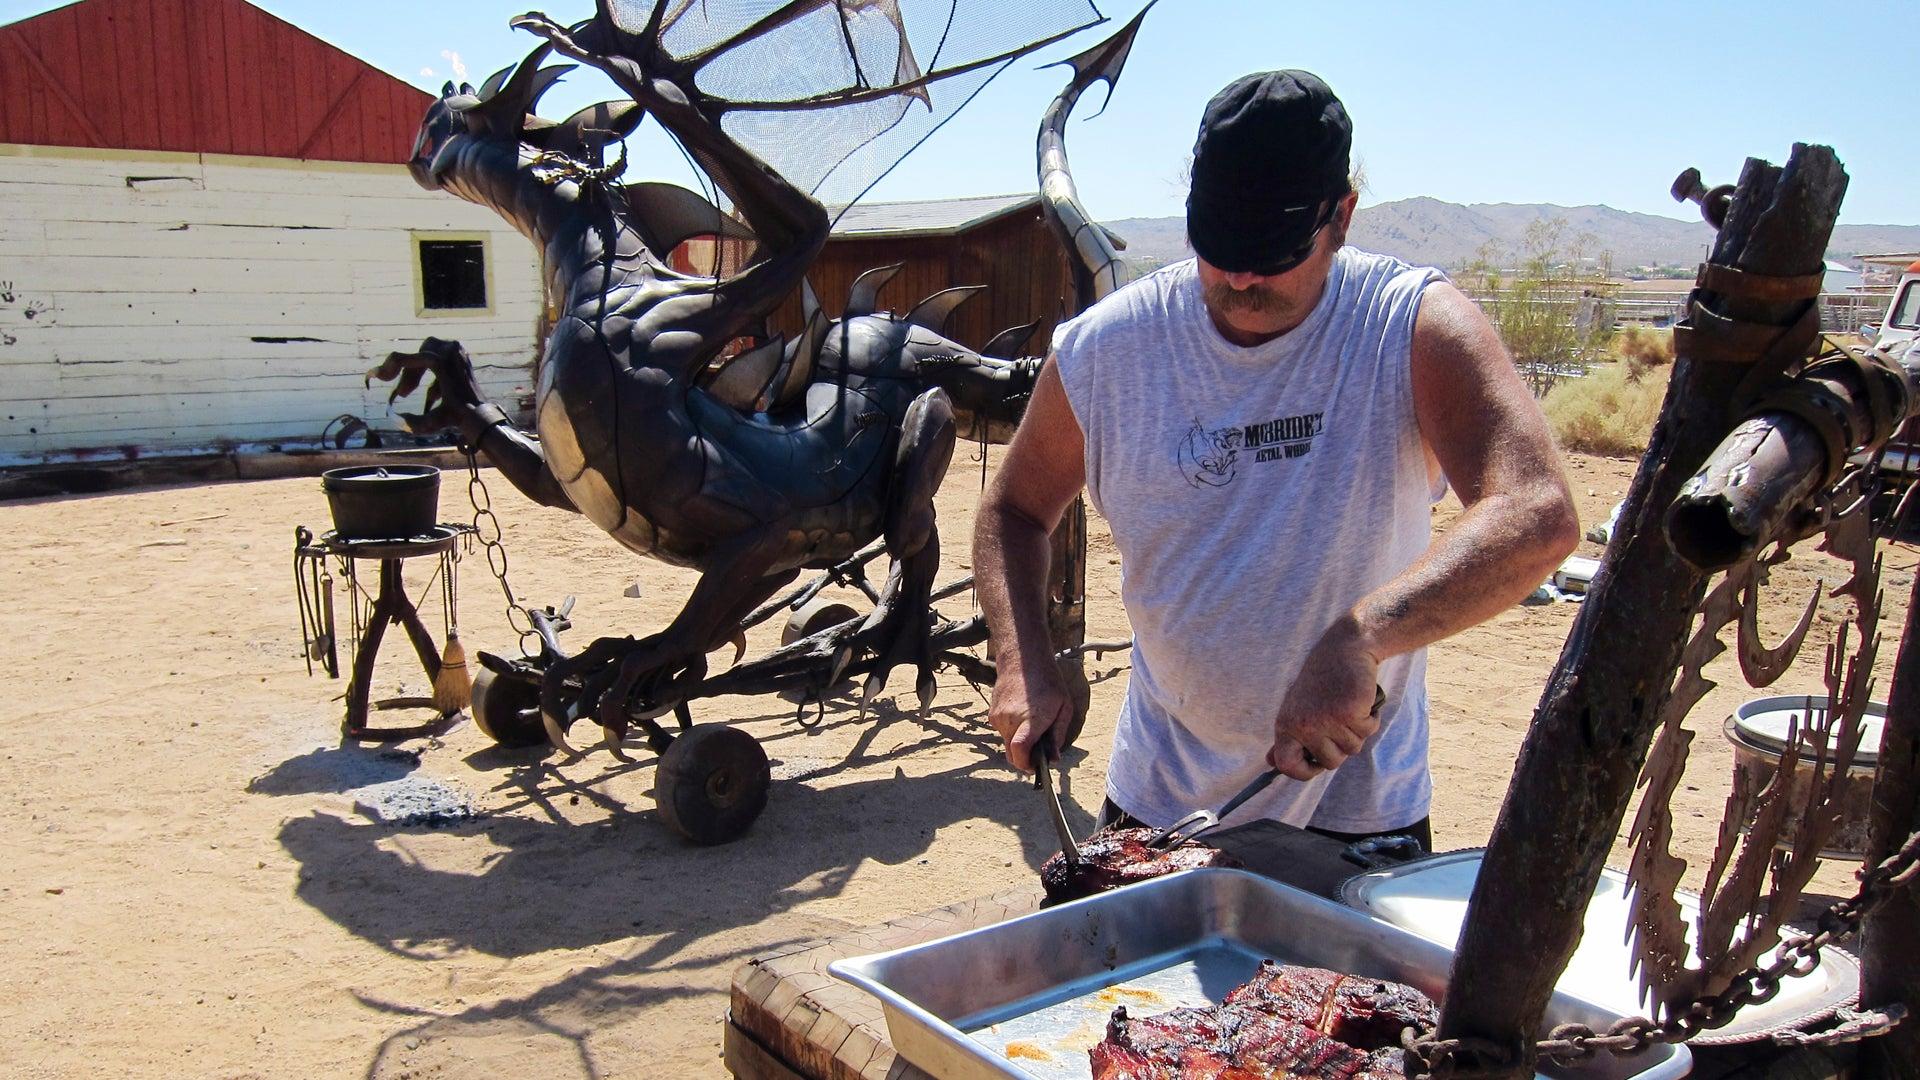 Epic BBQ Pits